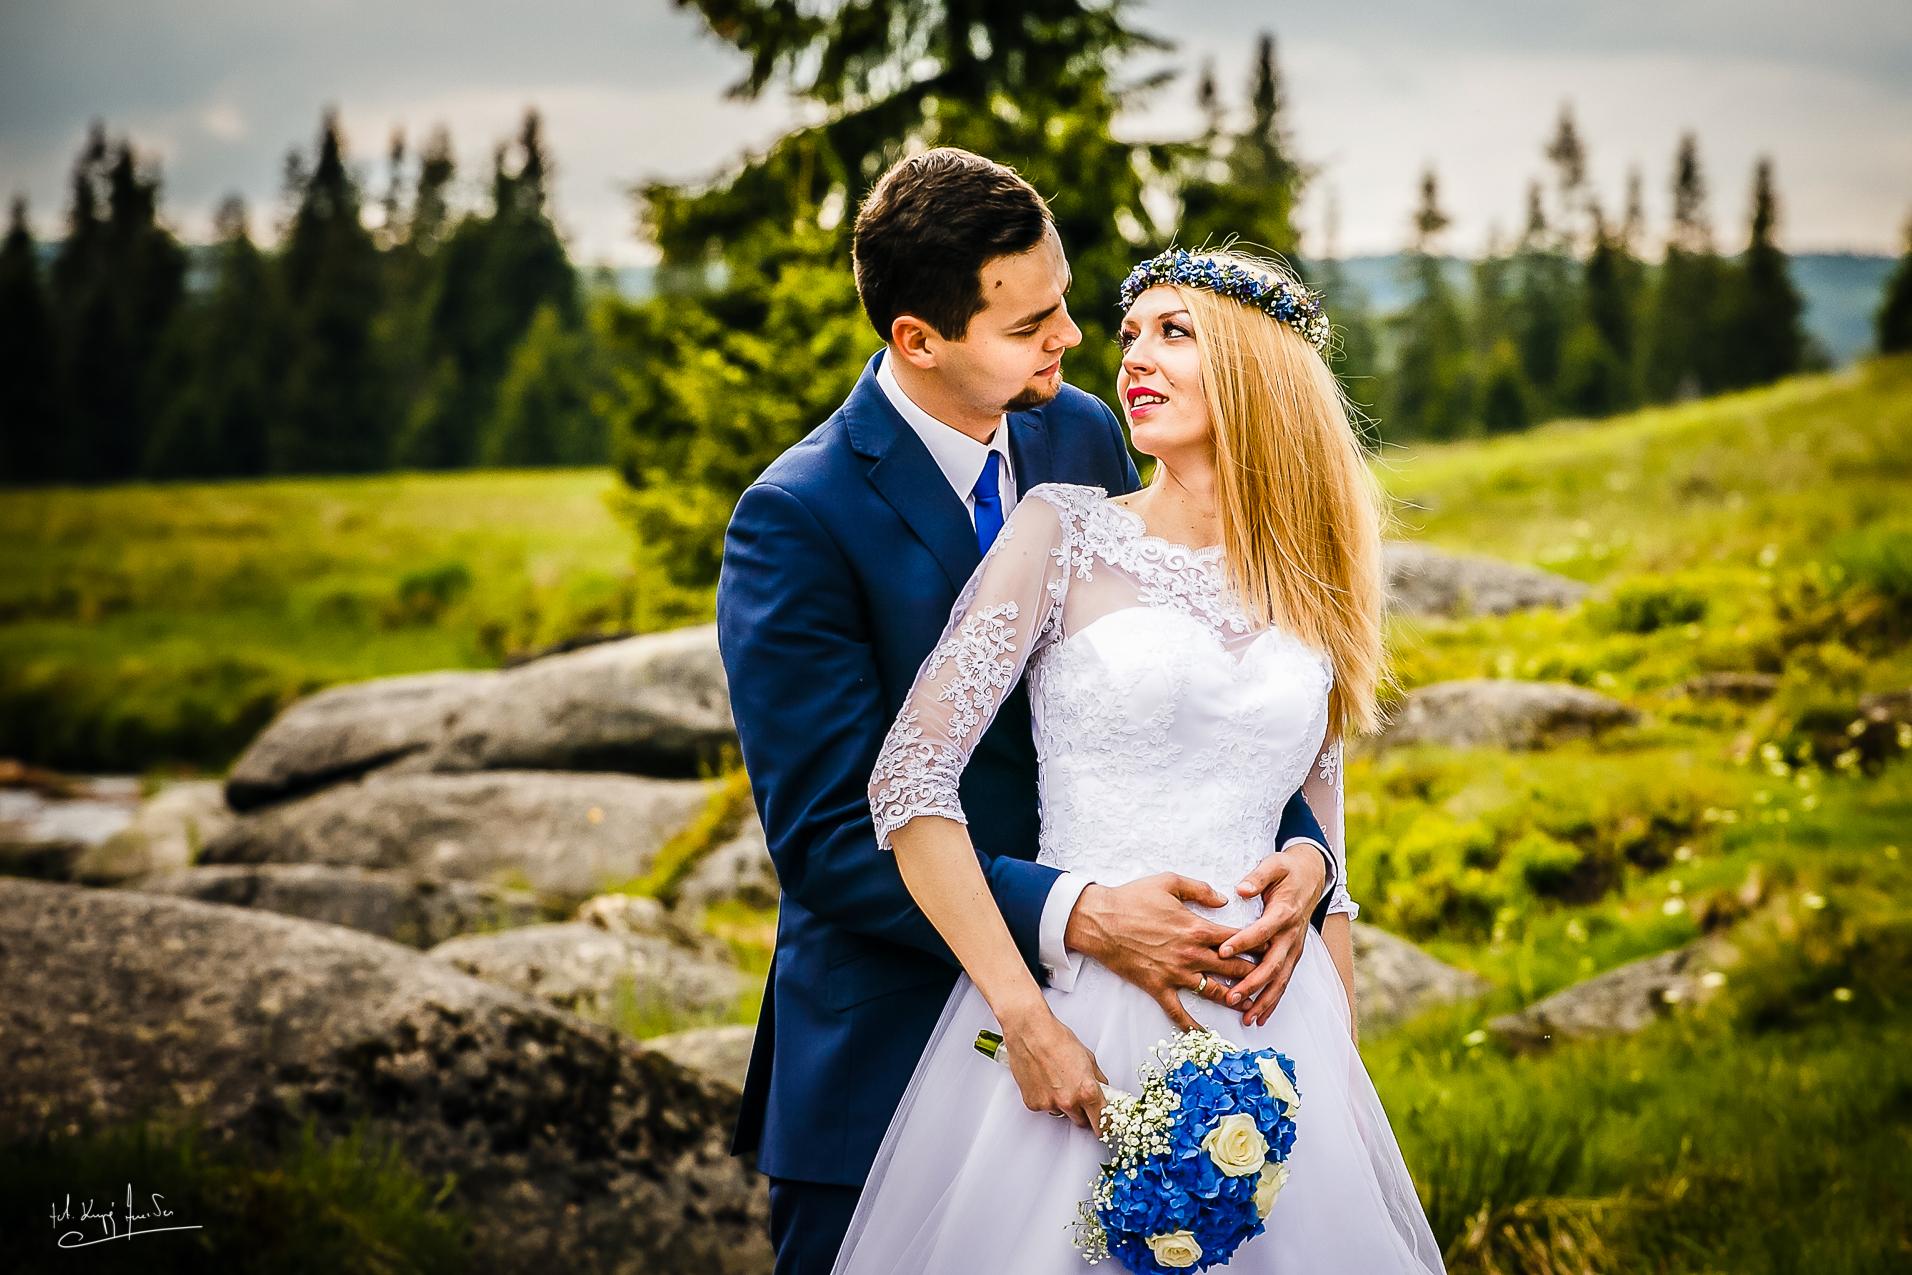 Ślub wesele szklarska poręba 42 Marta & Sławek